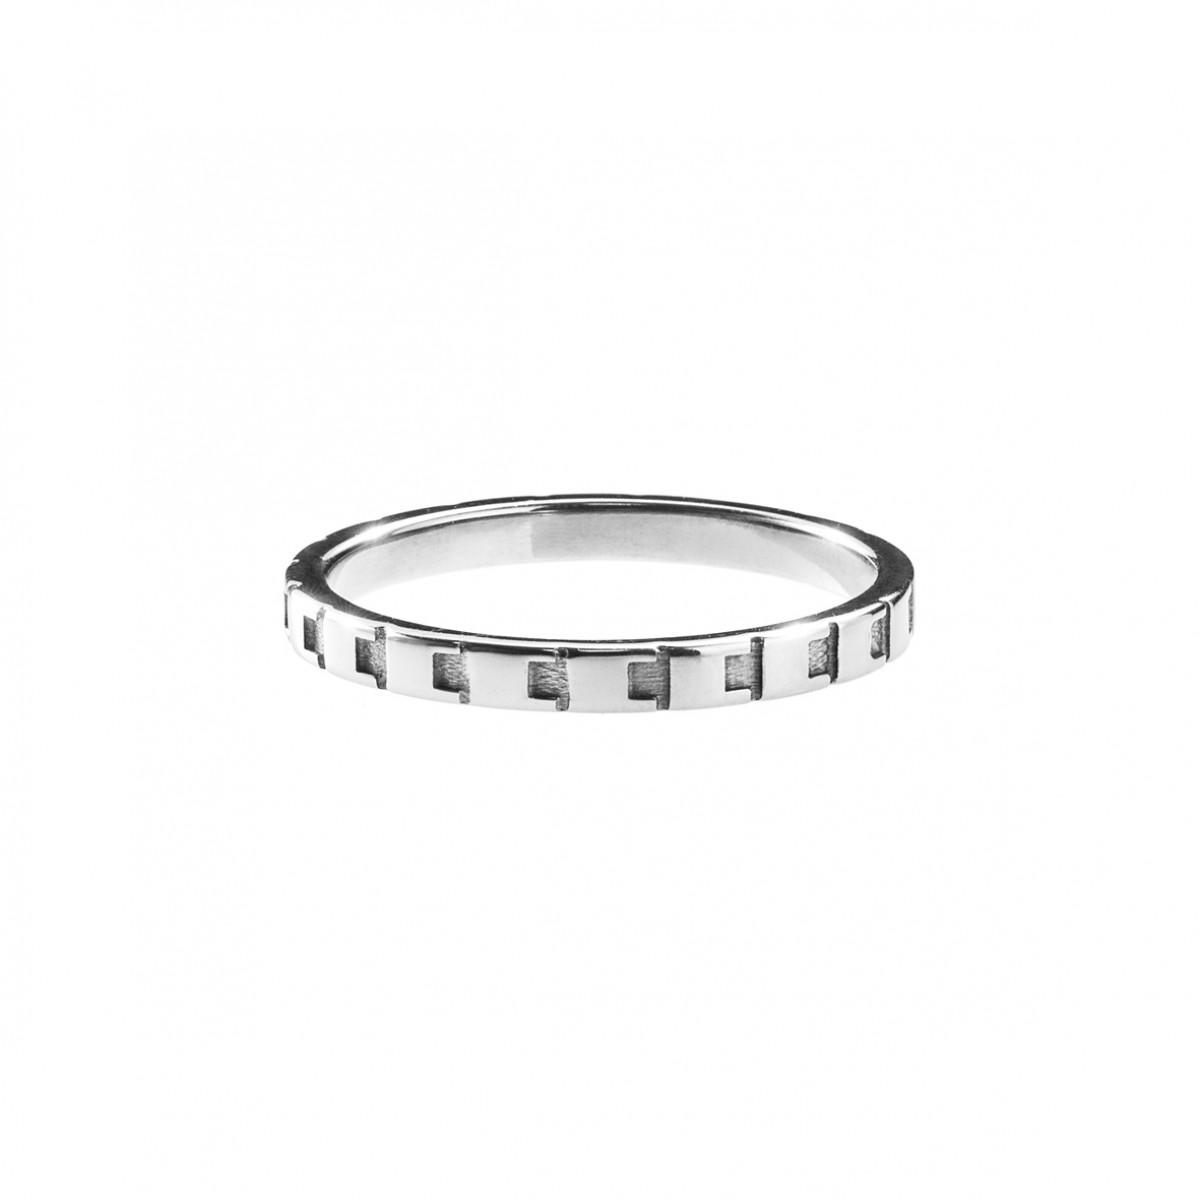 Jasmina Jovy Jewellery Decode! Ring RIDC02 silver